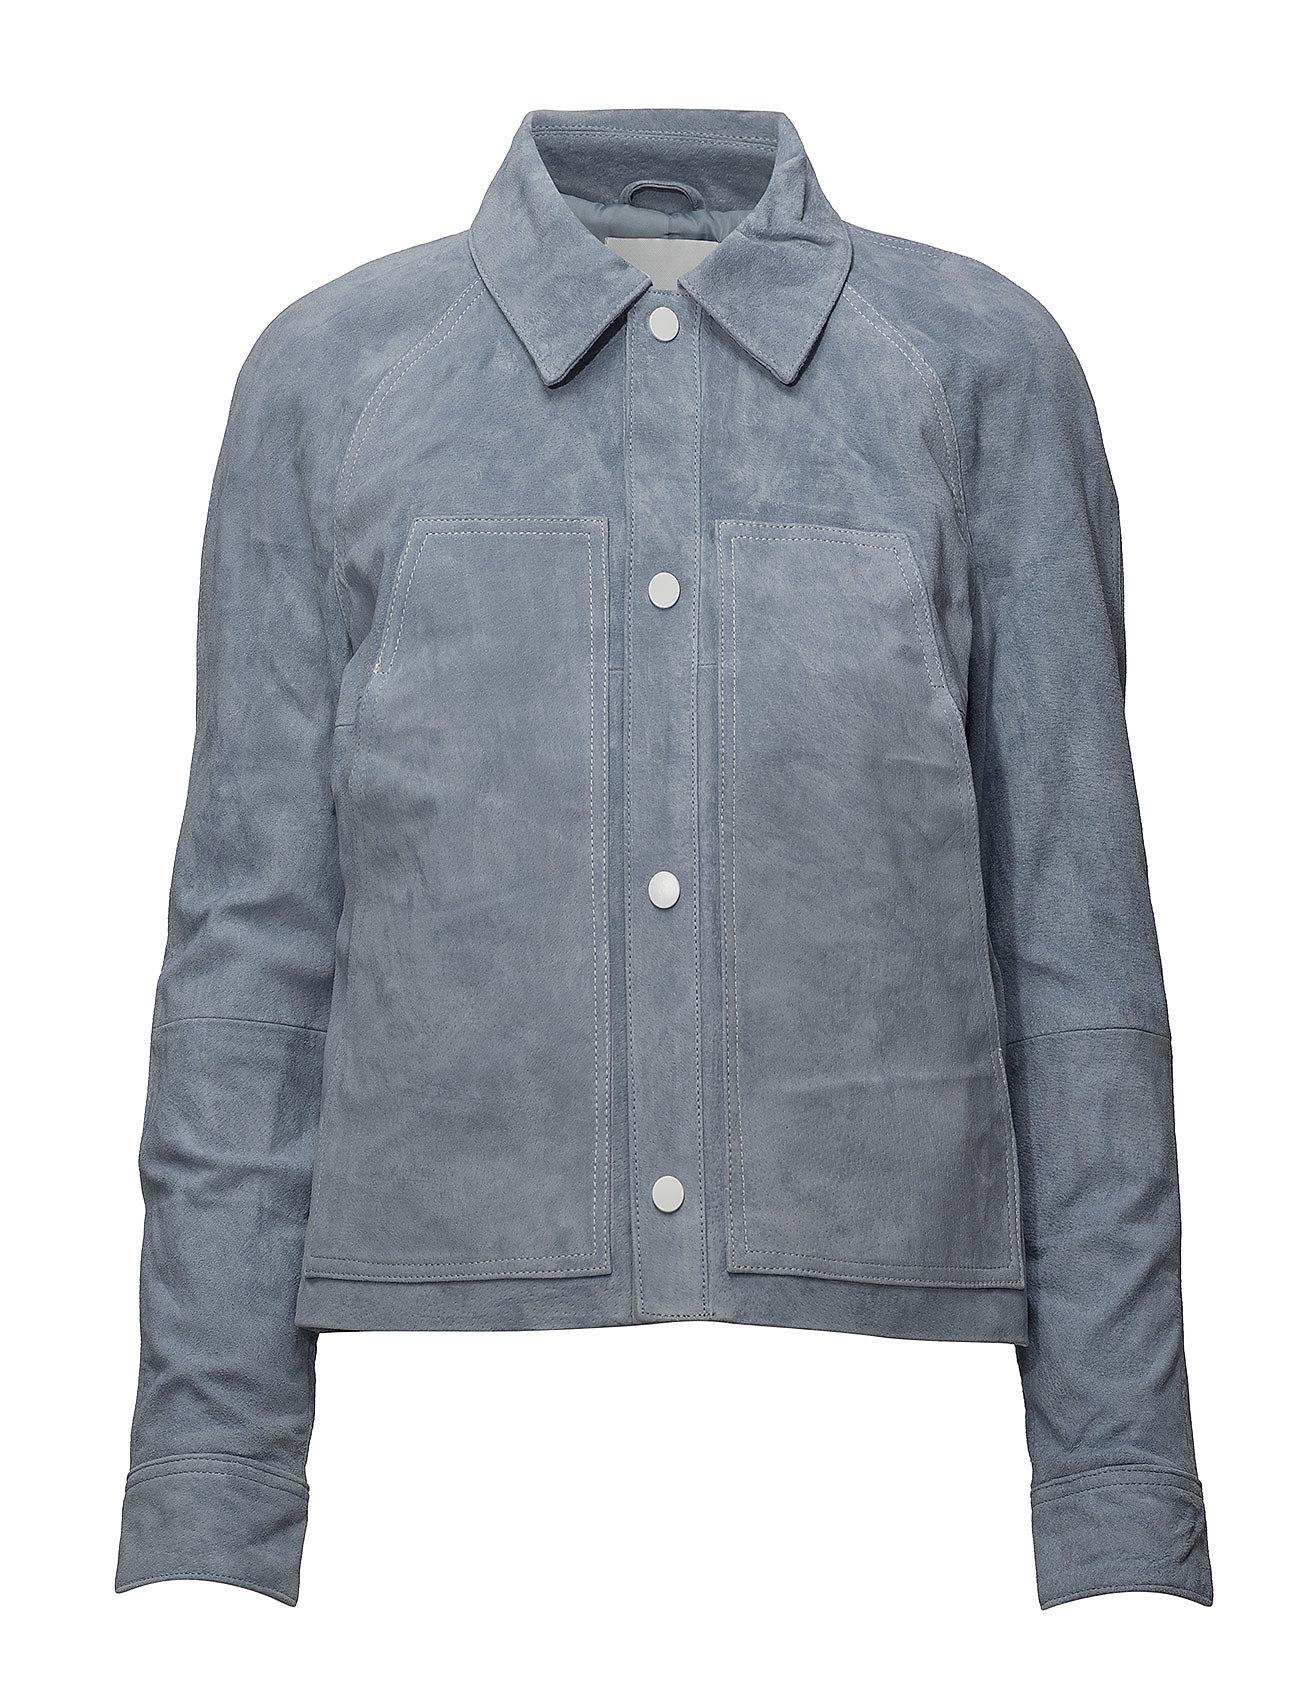 Mango Stich leather jacket